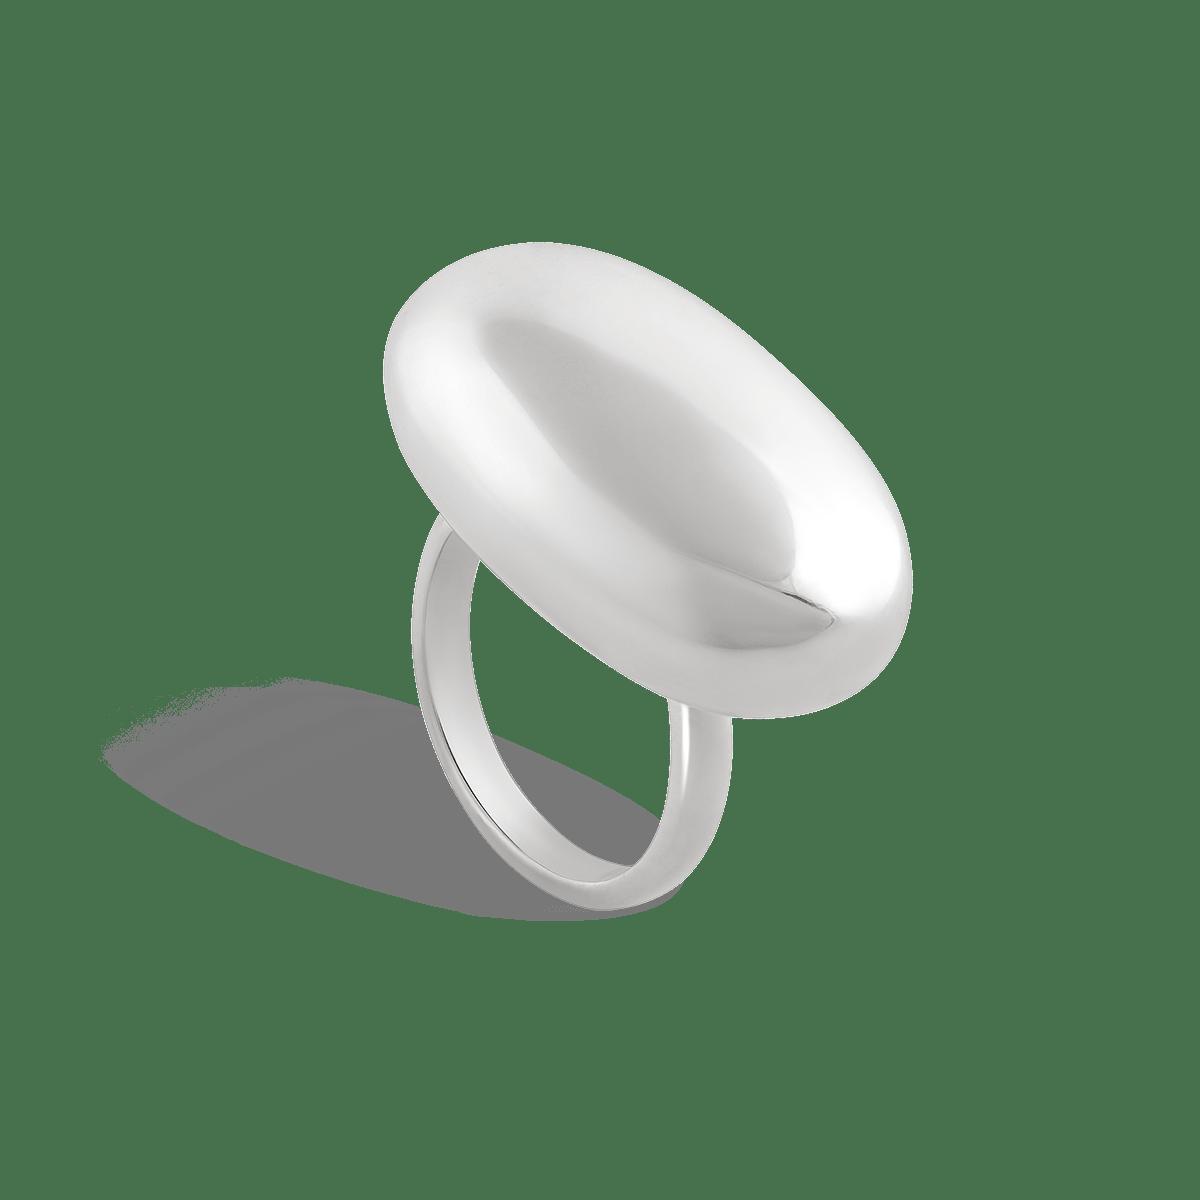 انگشتر نقره اوال Oval